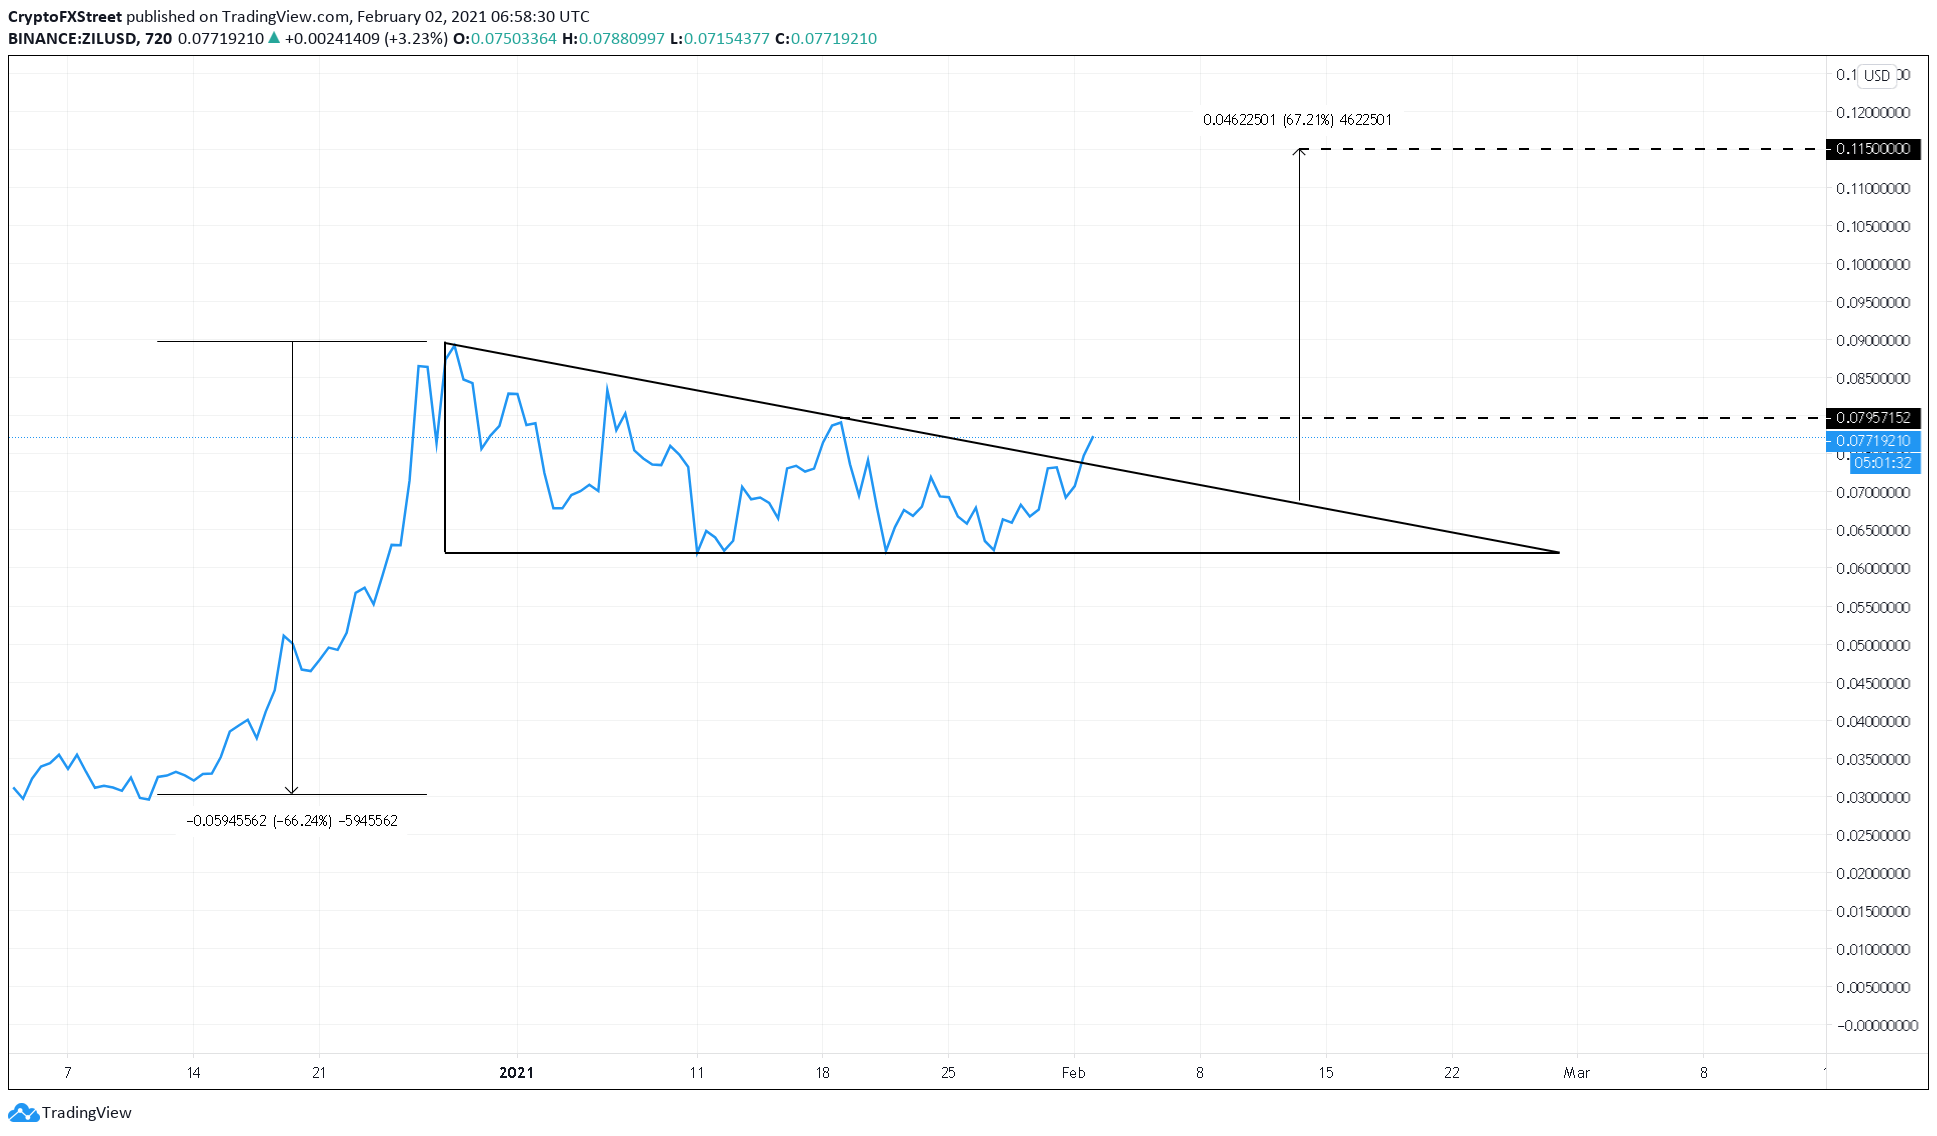 ZIL/USDT 12-hour chart